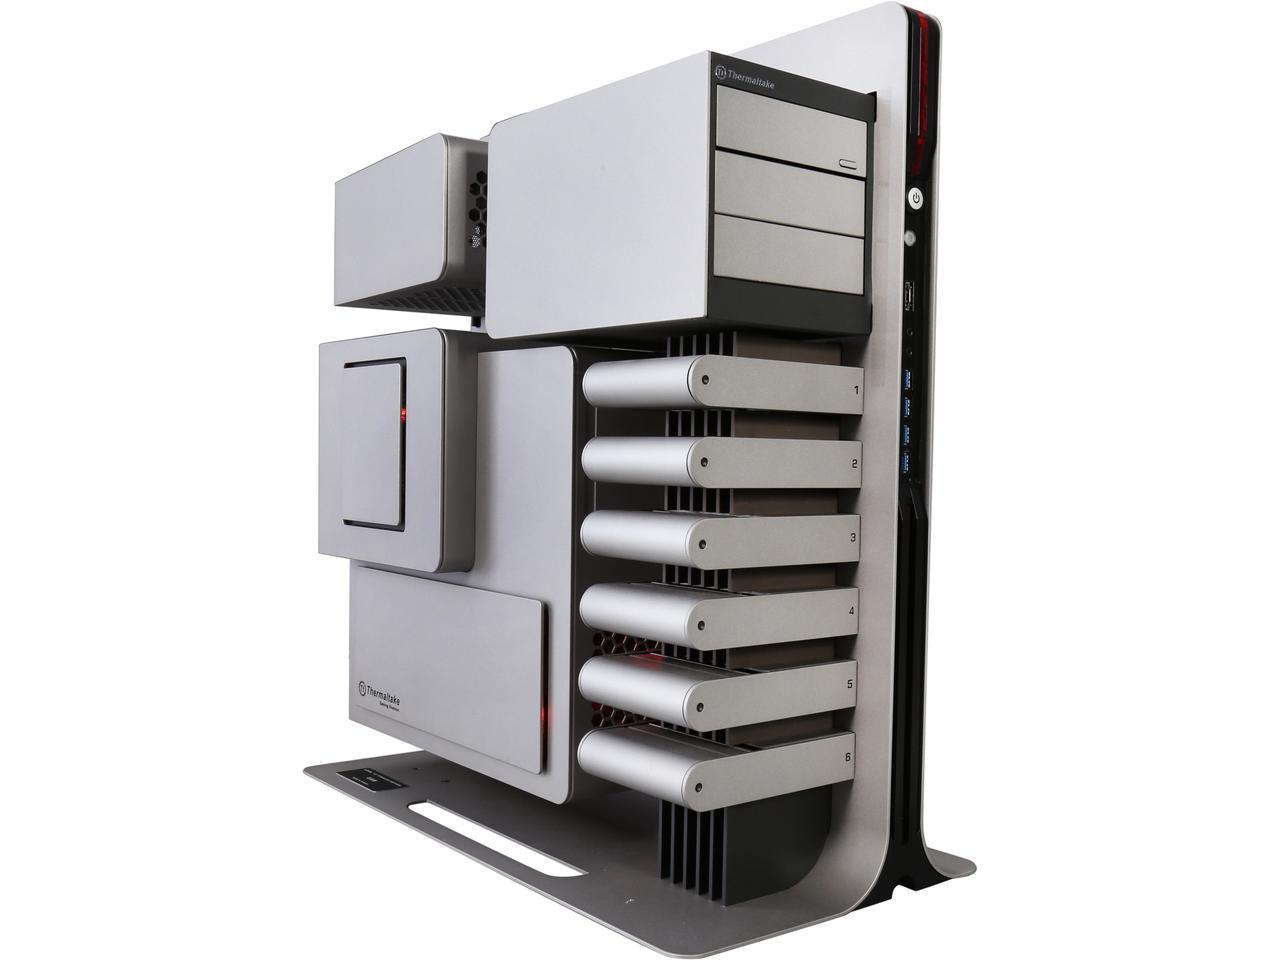 The 10 Craziest PC Cases on Newegg - Newegg Insider